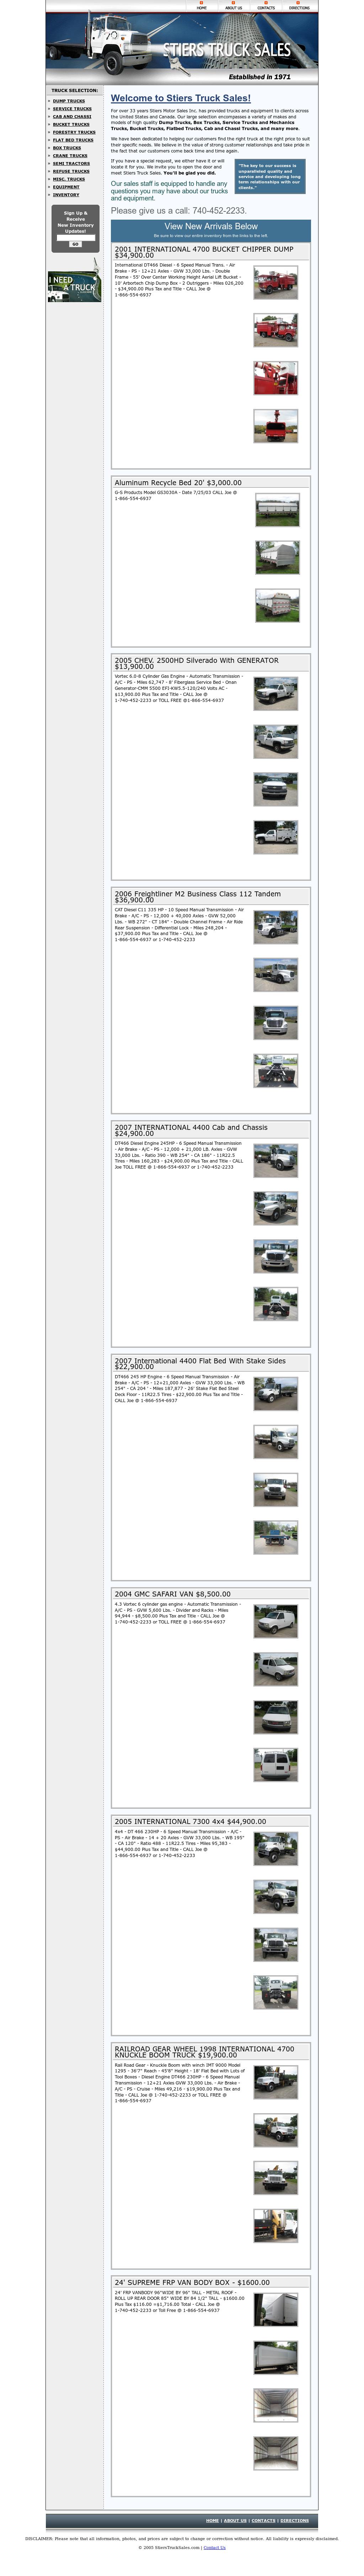 95 Chevy 1500 4x4 5 Speed Transmission